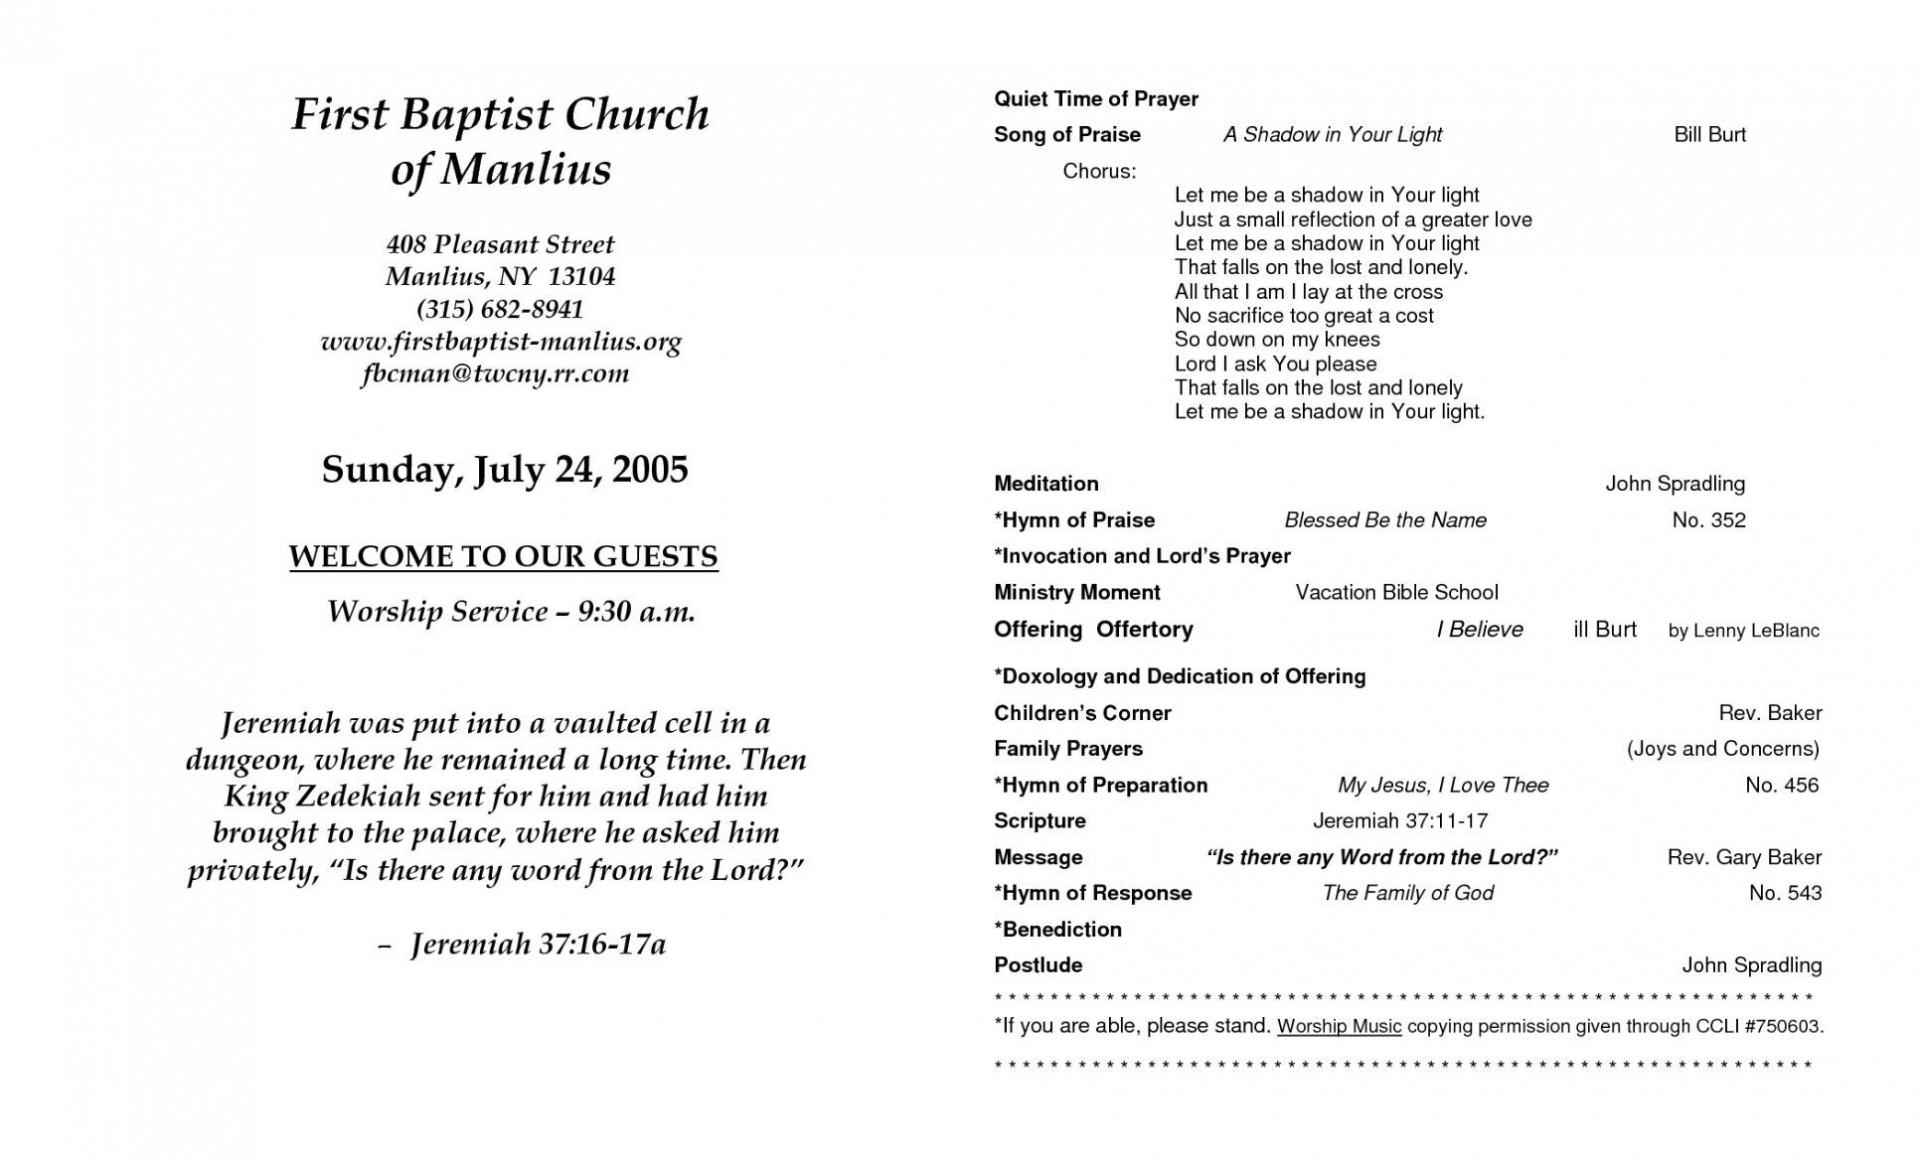 000 Formidable Church Bulletin Template Word Photo  Program Free Wedding1920